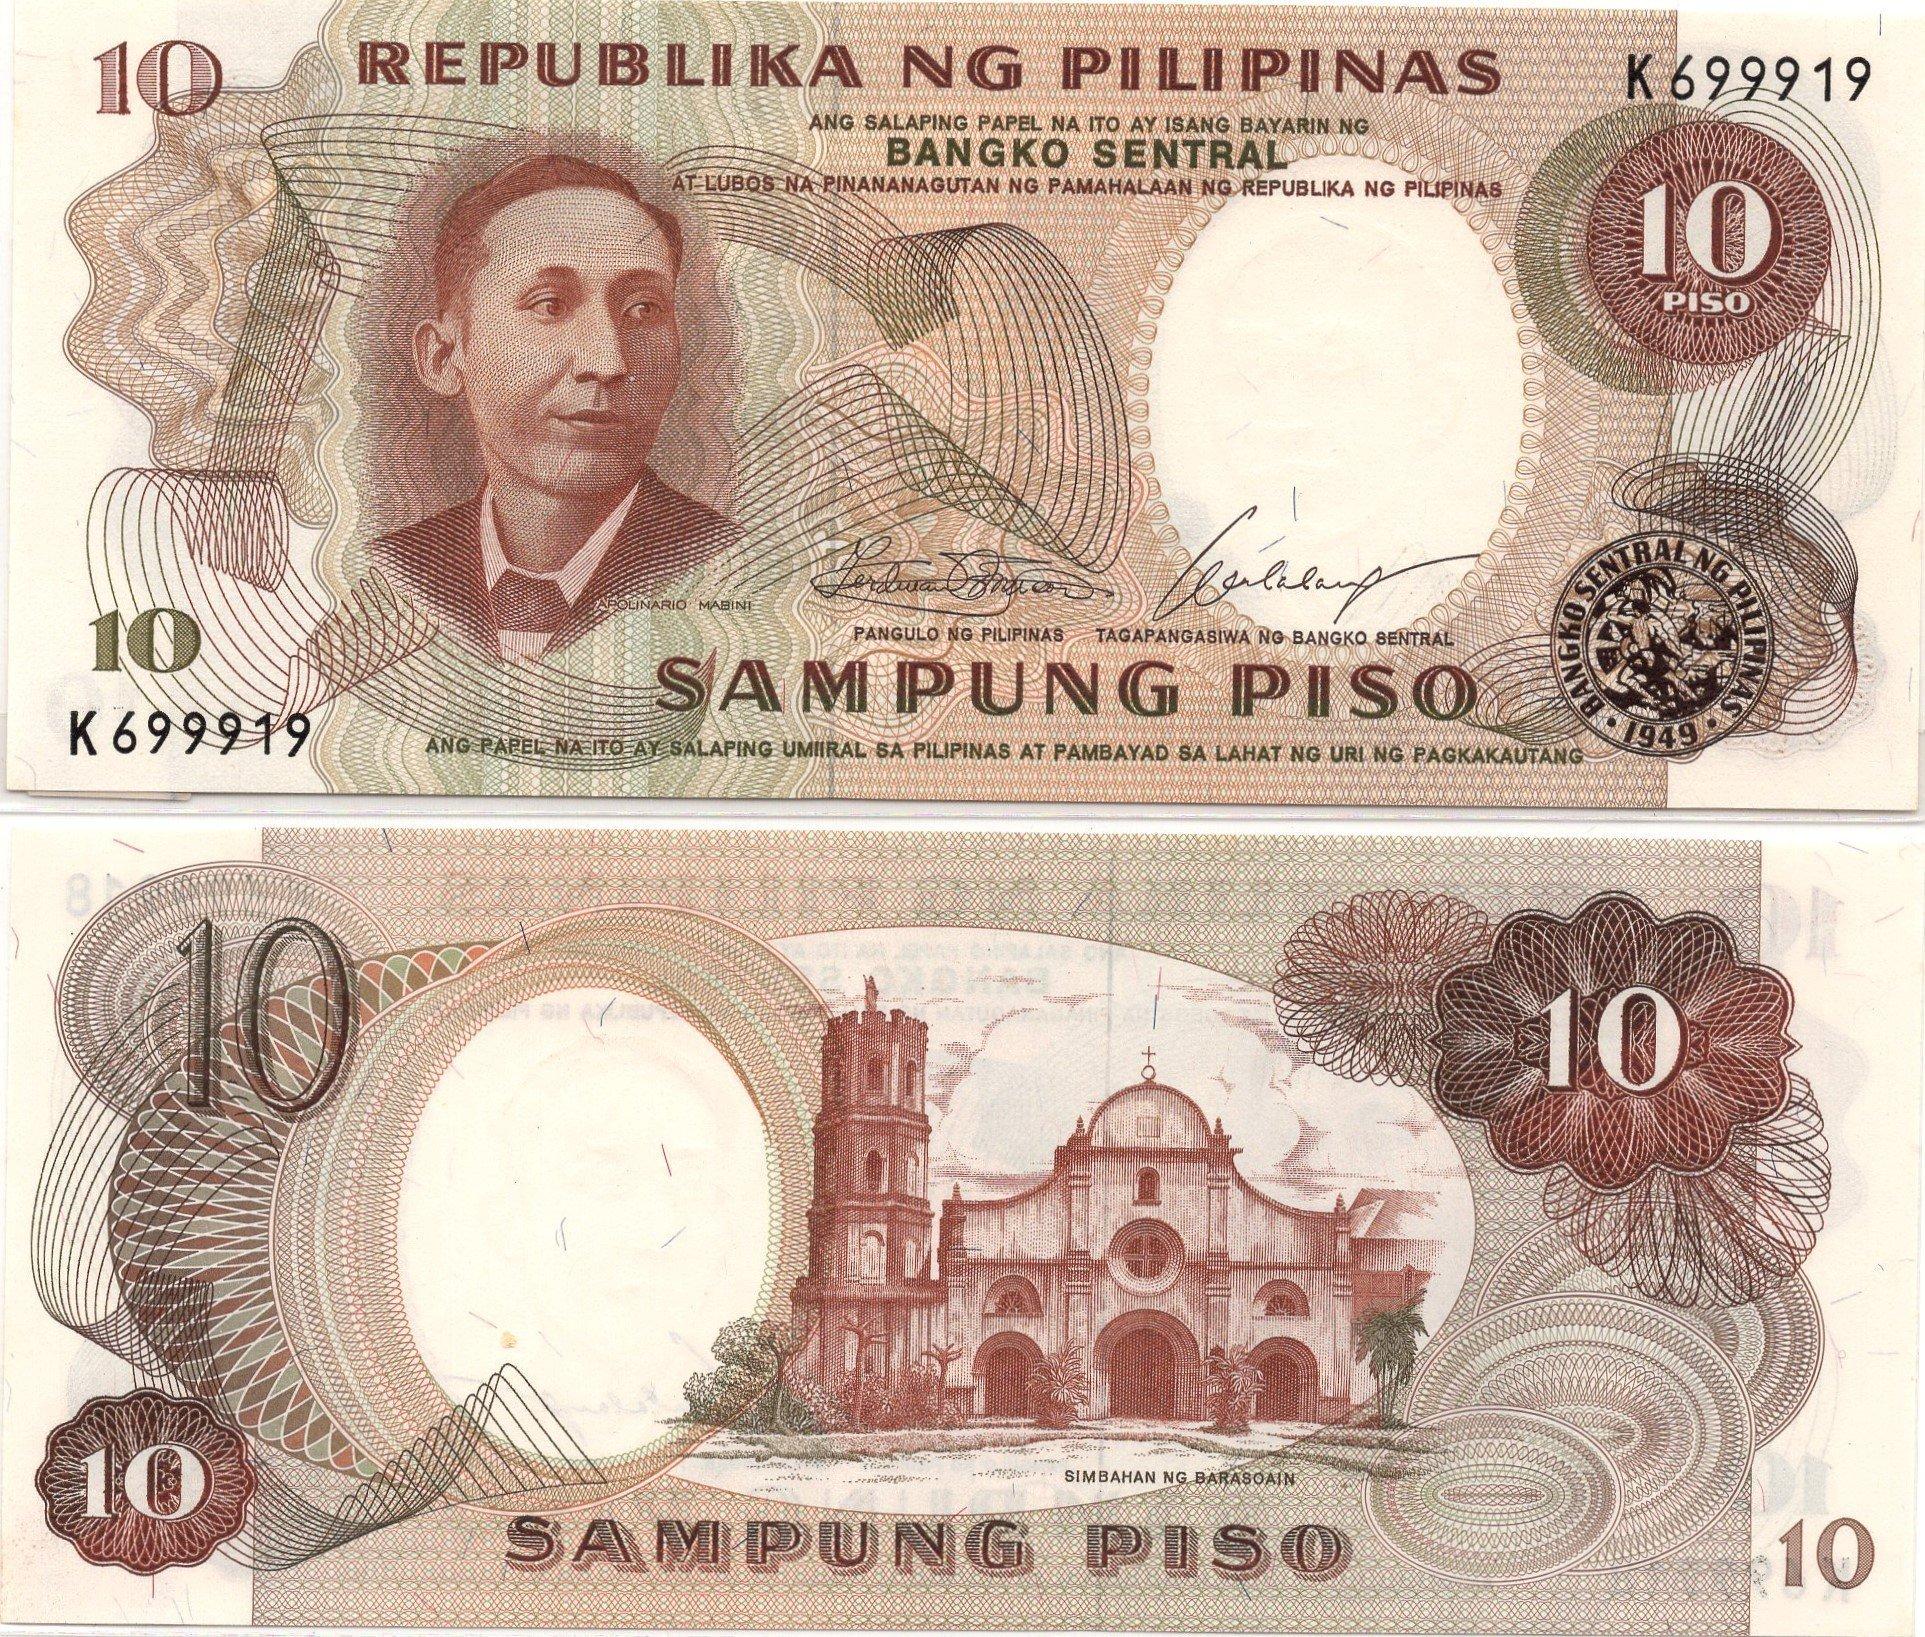 [hilipines 10 pesos 1969